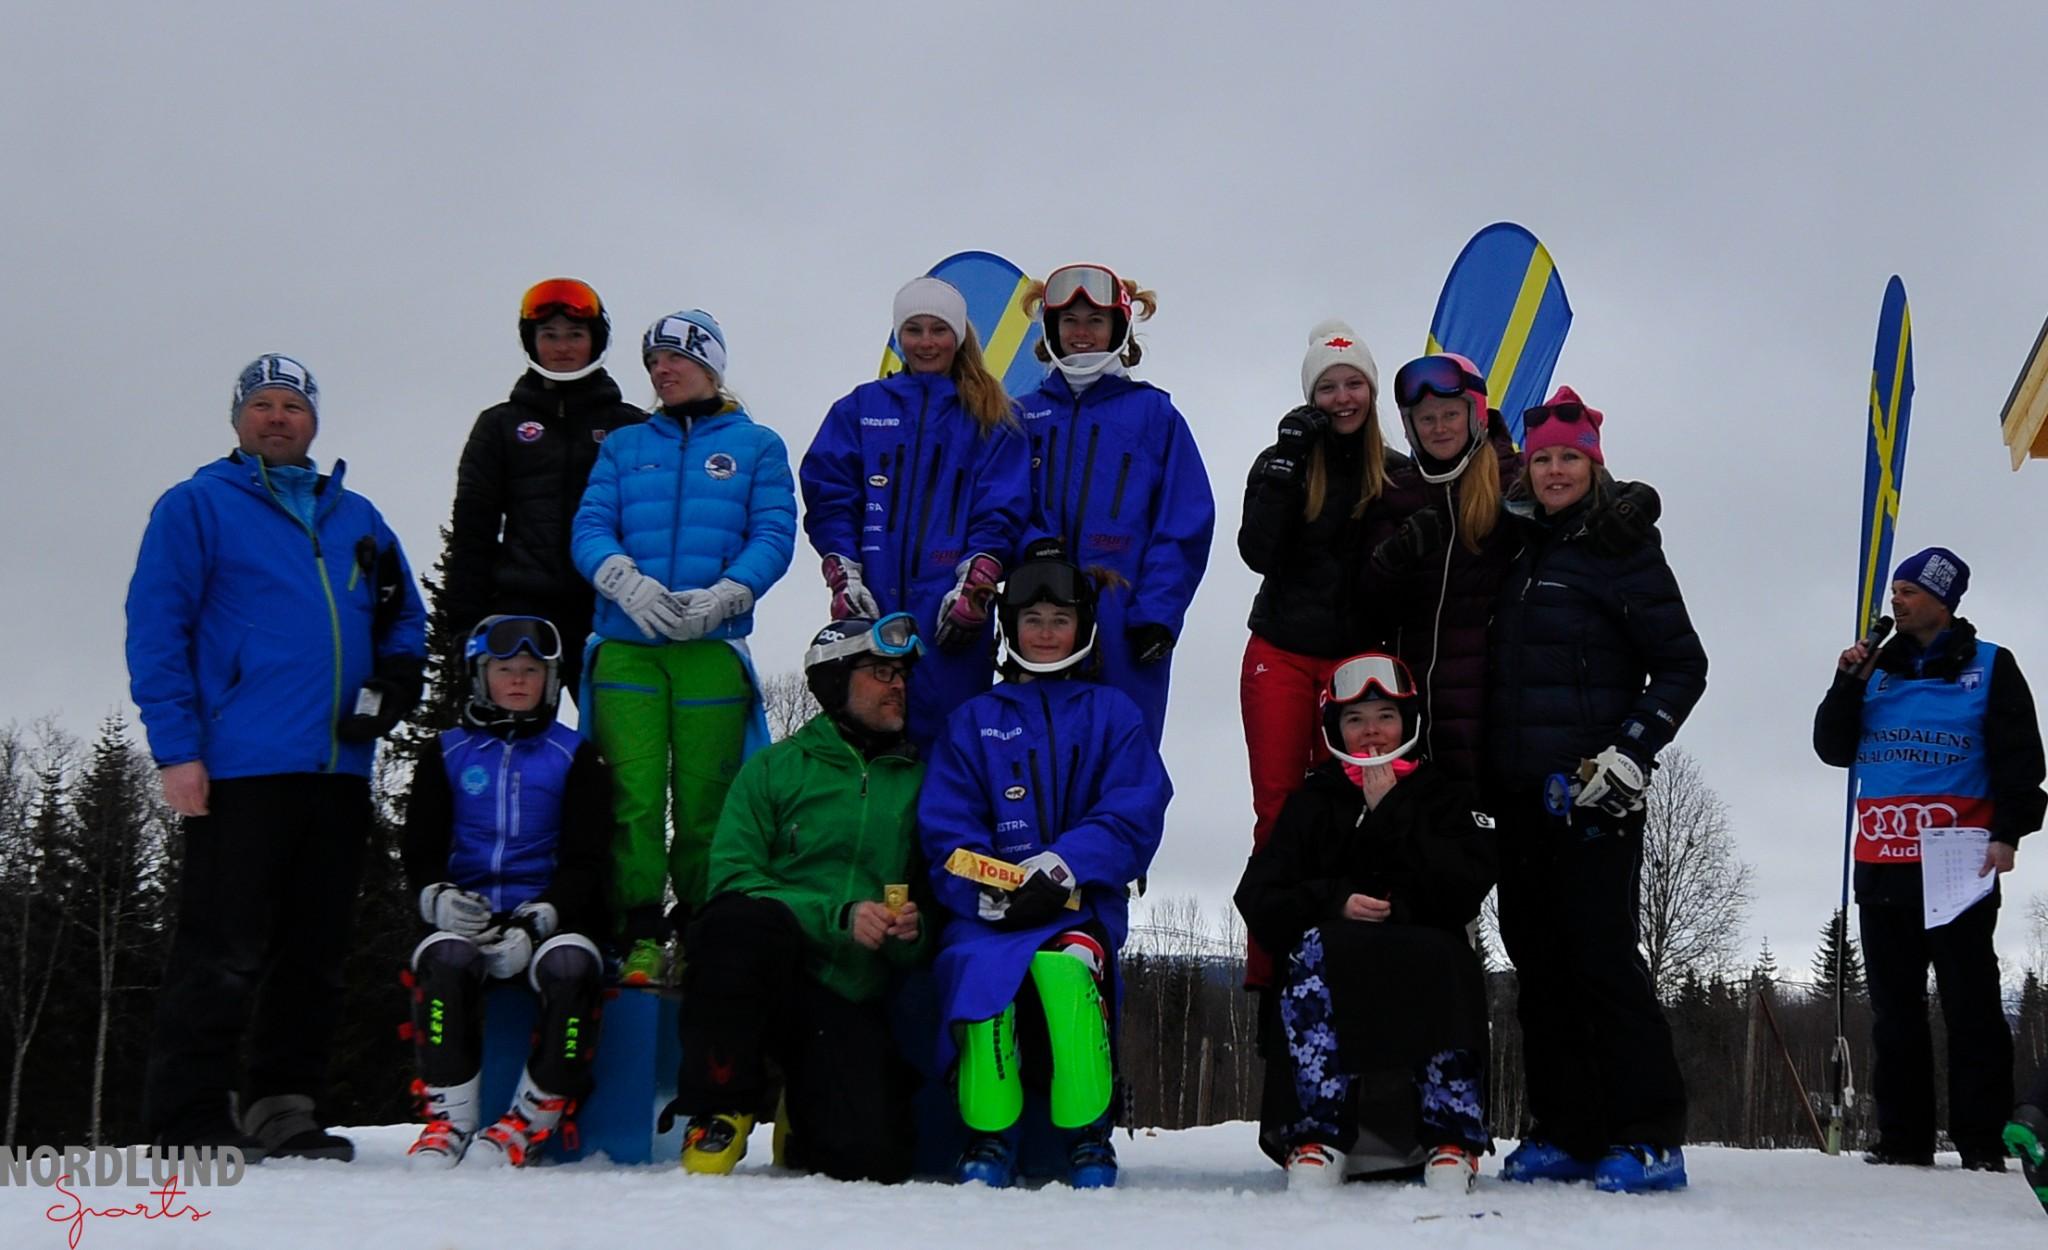 Lagguld U15 slalom